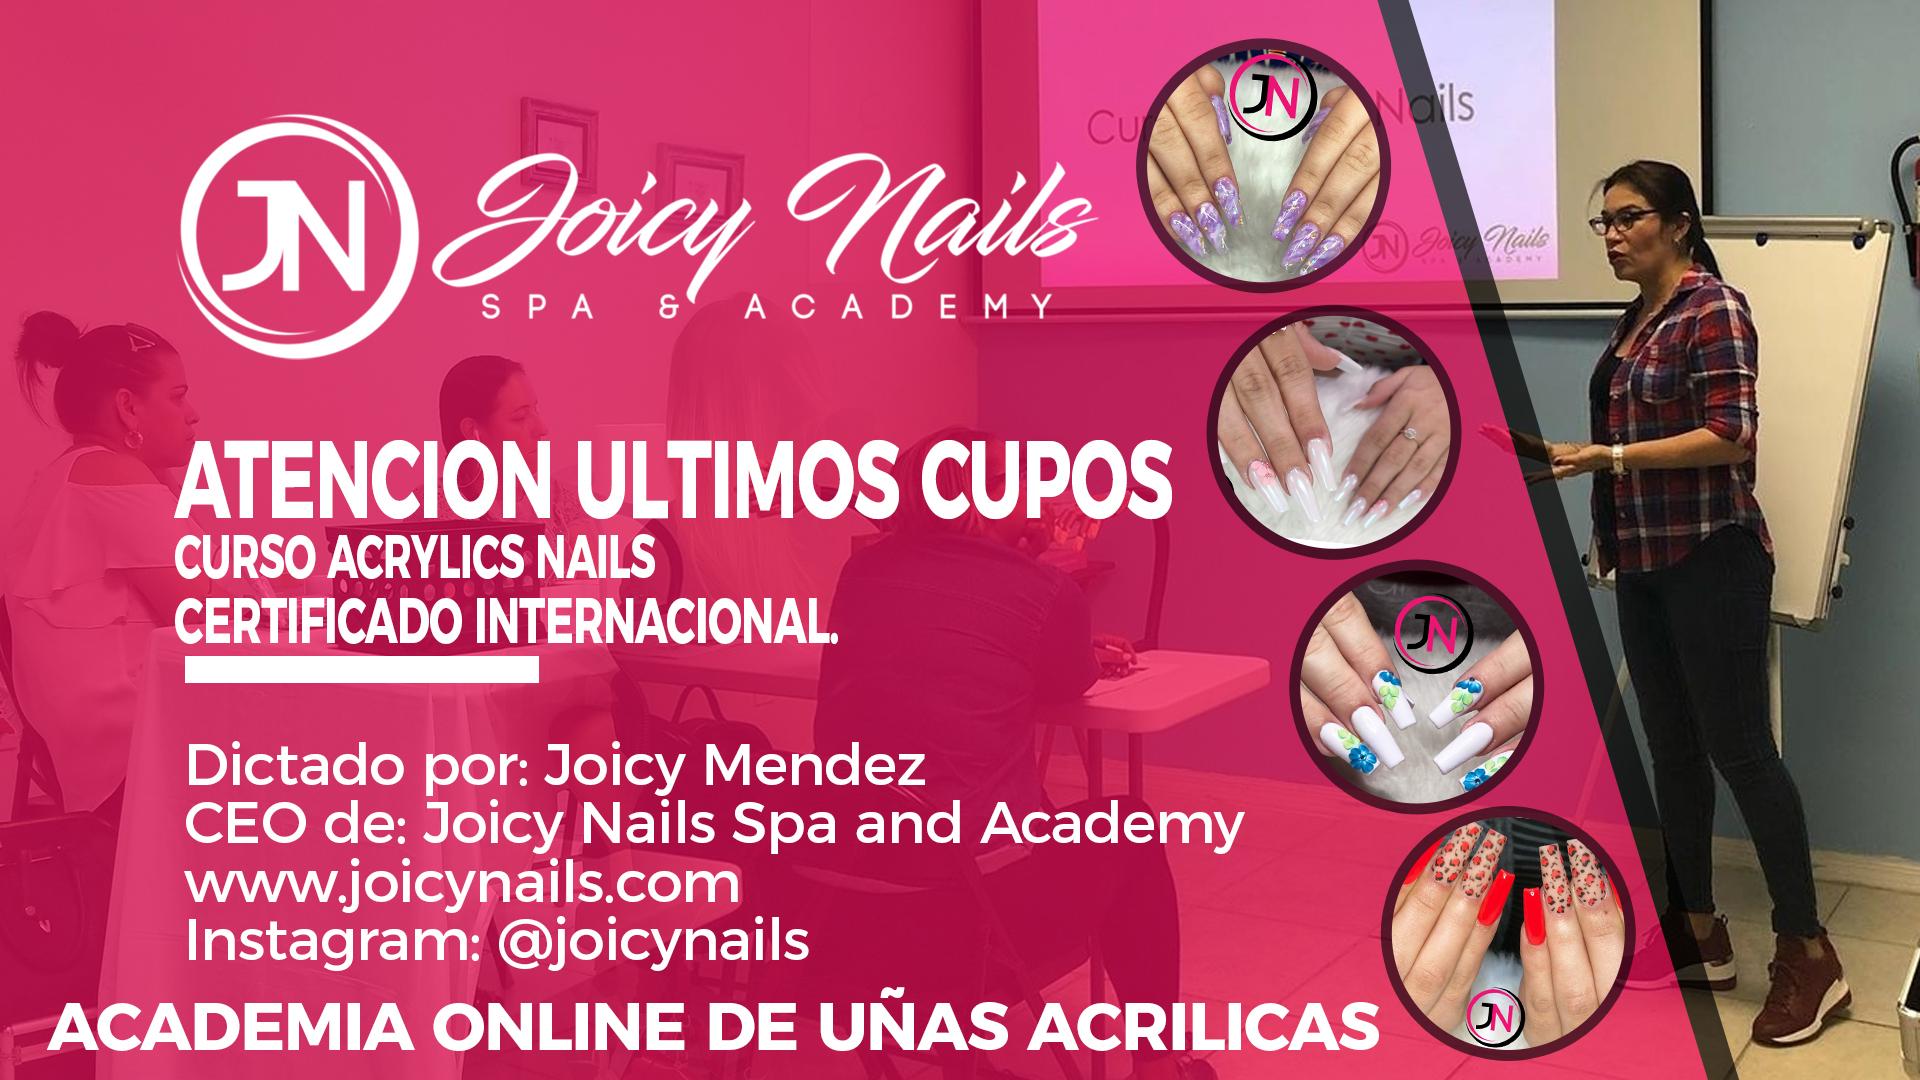 CURSO COMPLETO ACRYLICS NAILS